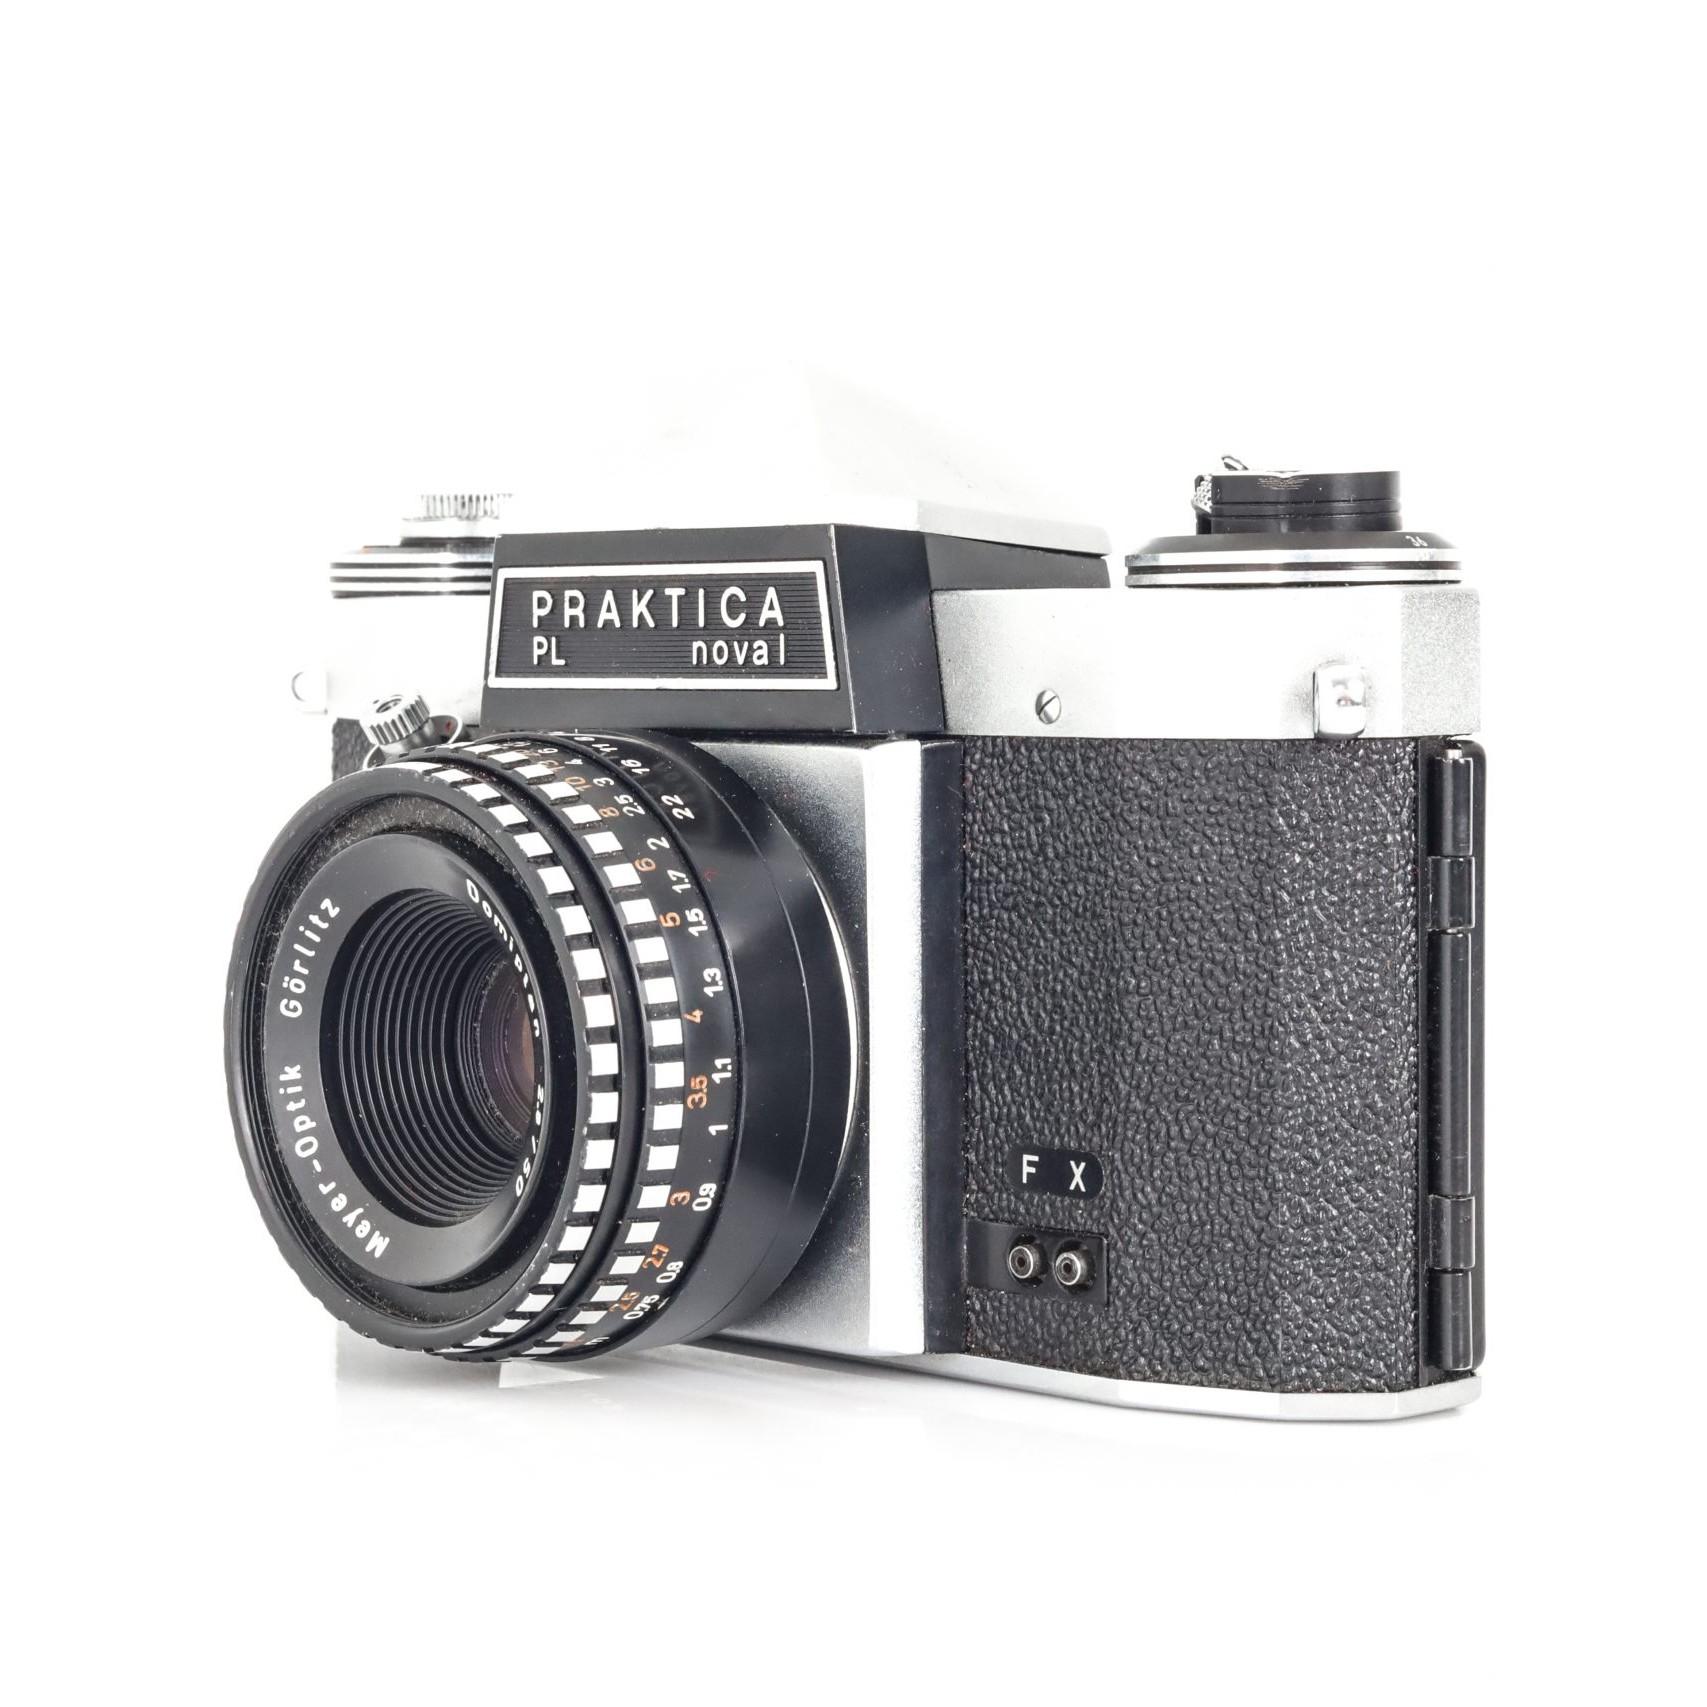 Brilliant 1970s Praktica PL Nova I 35mm Film Camera with Faulty Domiplan F2.8